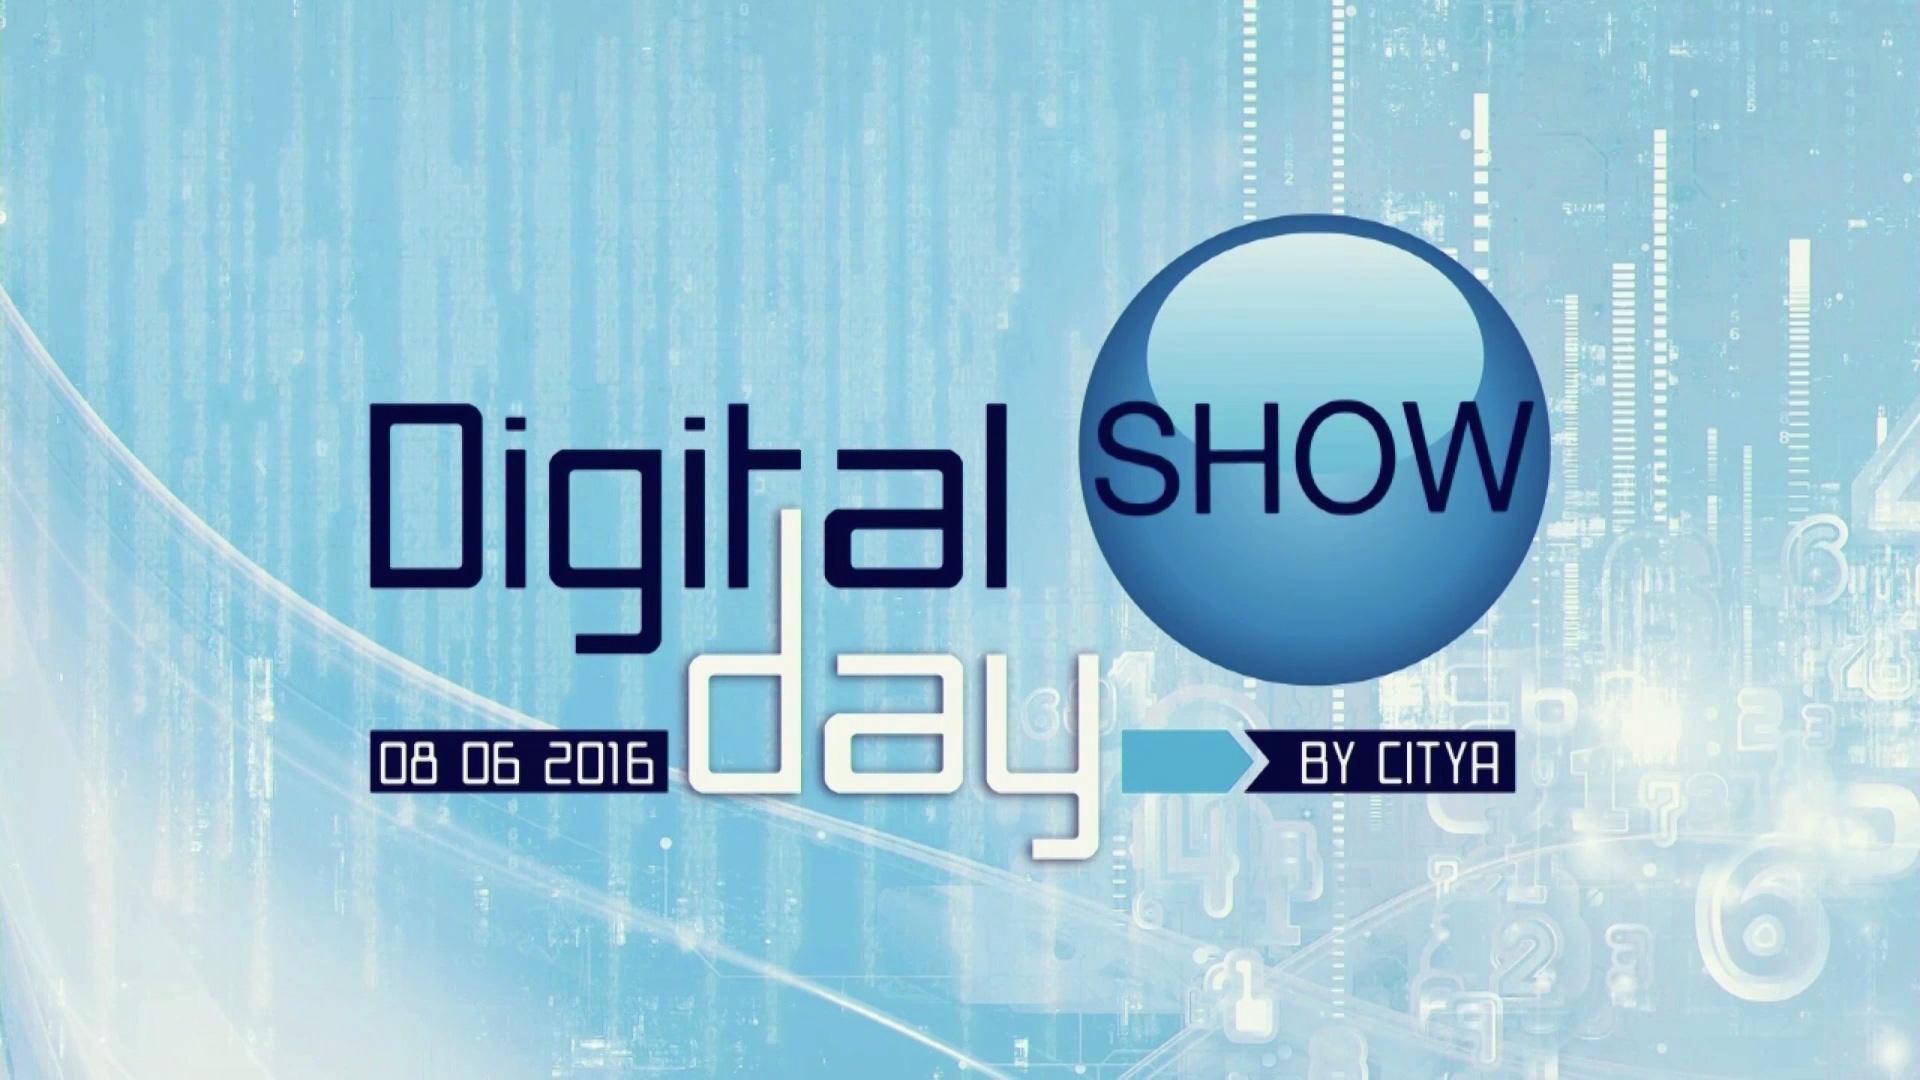 Directeurs - 2016 - Lyon - Citya Digital Day Show